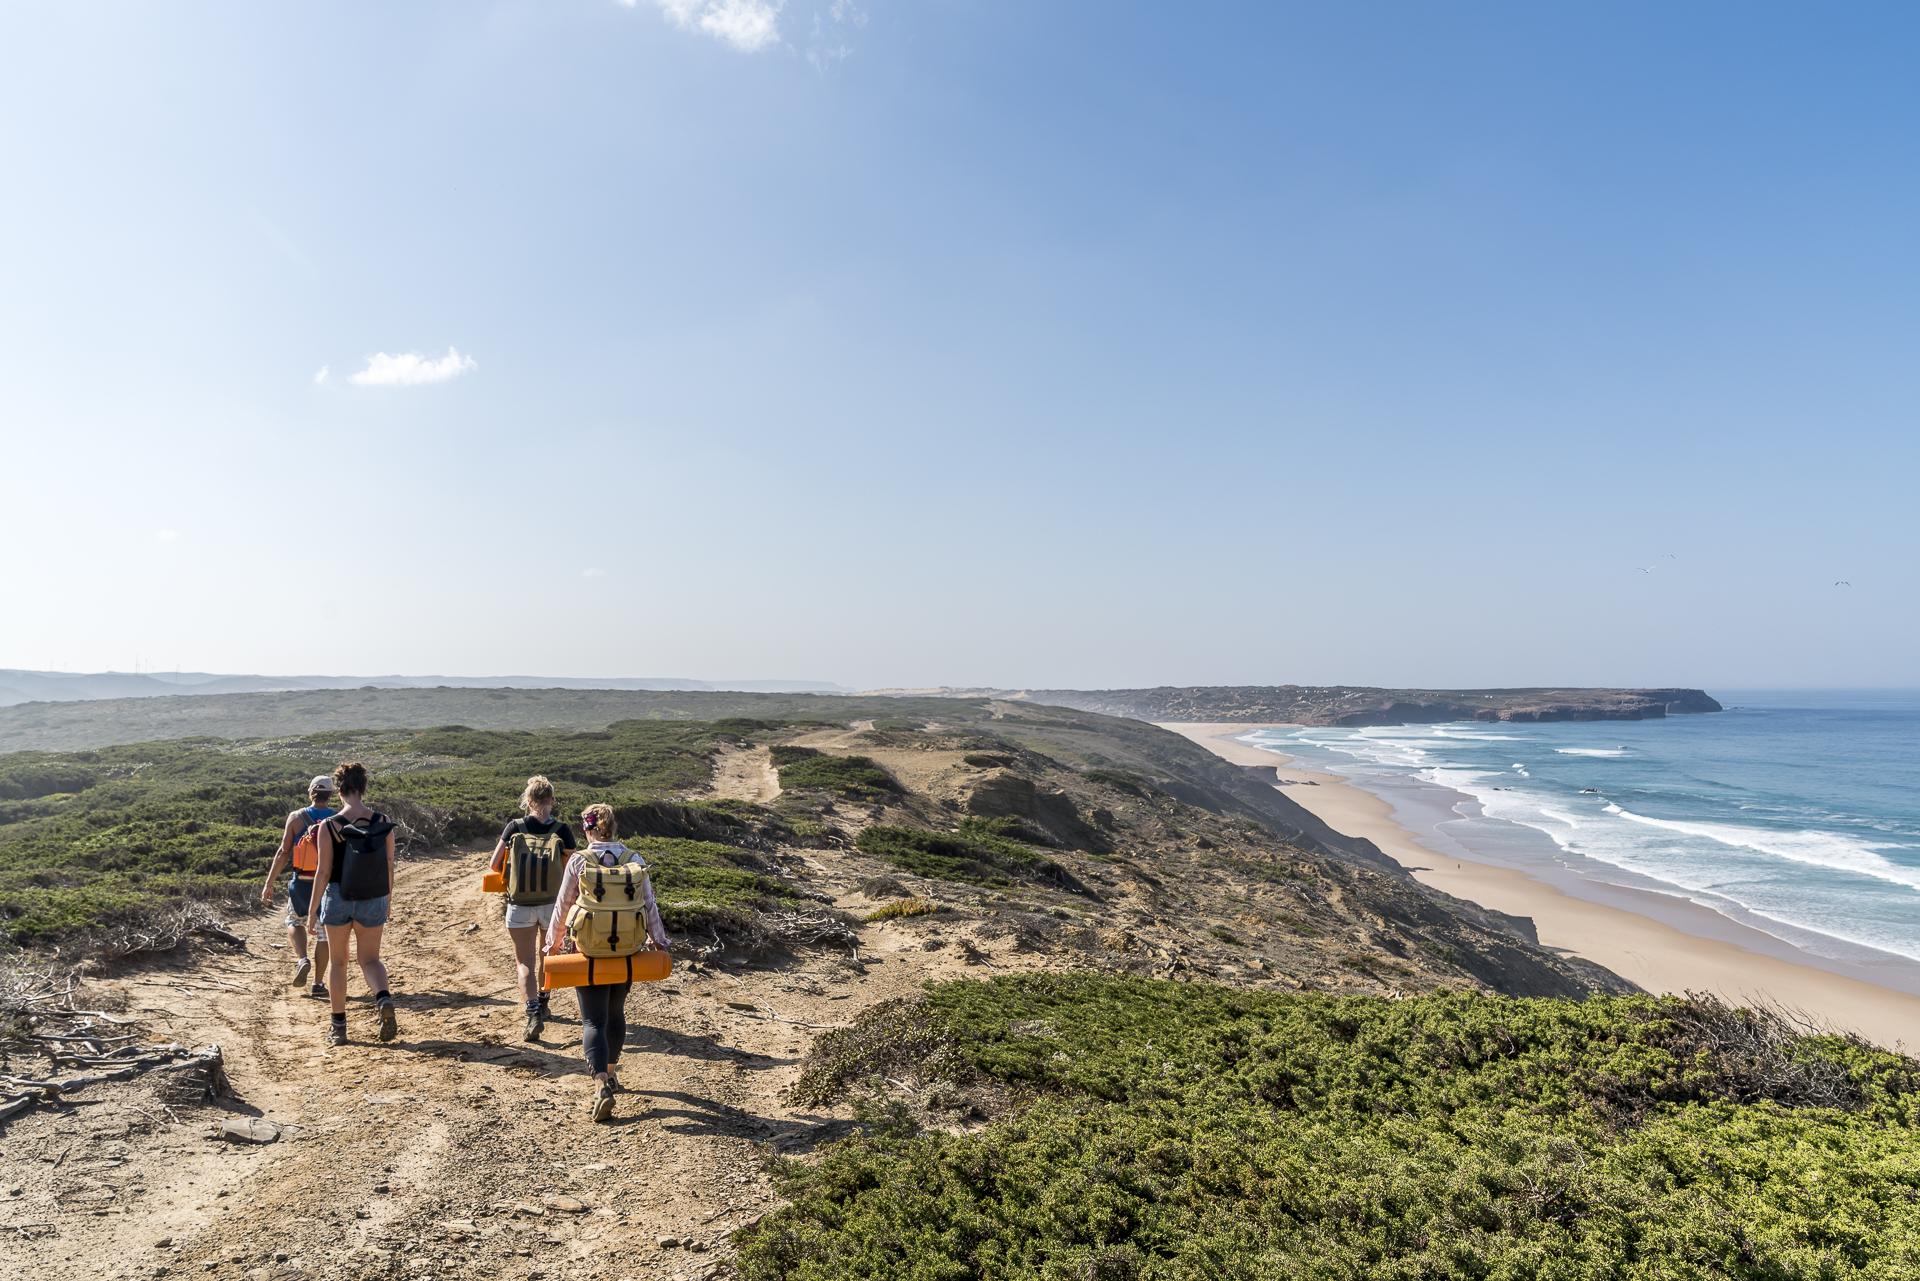 Wanderung Praia da Bordeira